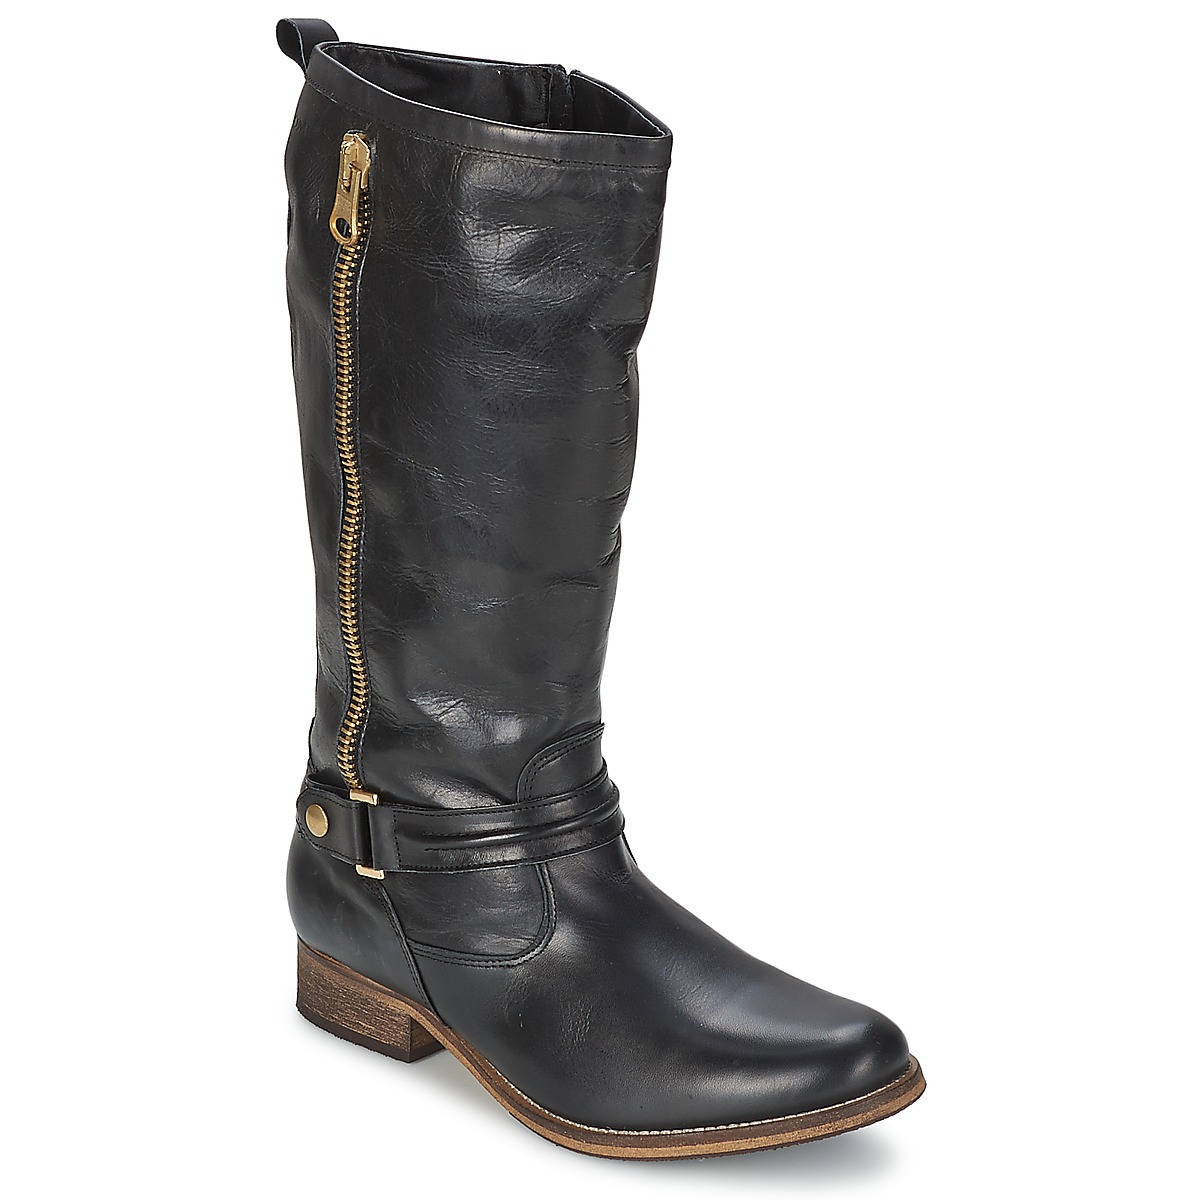 Botte ville Nome Footwear SASSIF CASU Noir